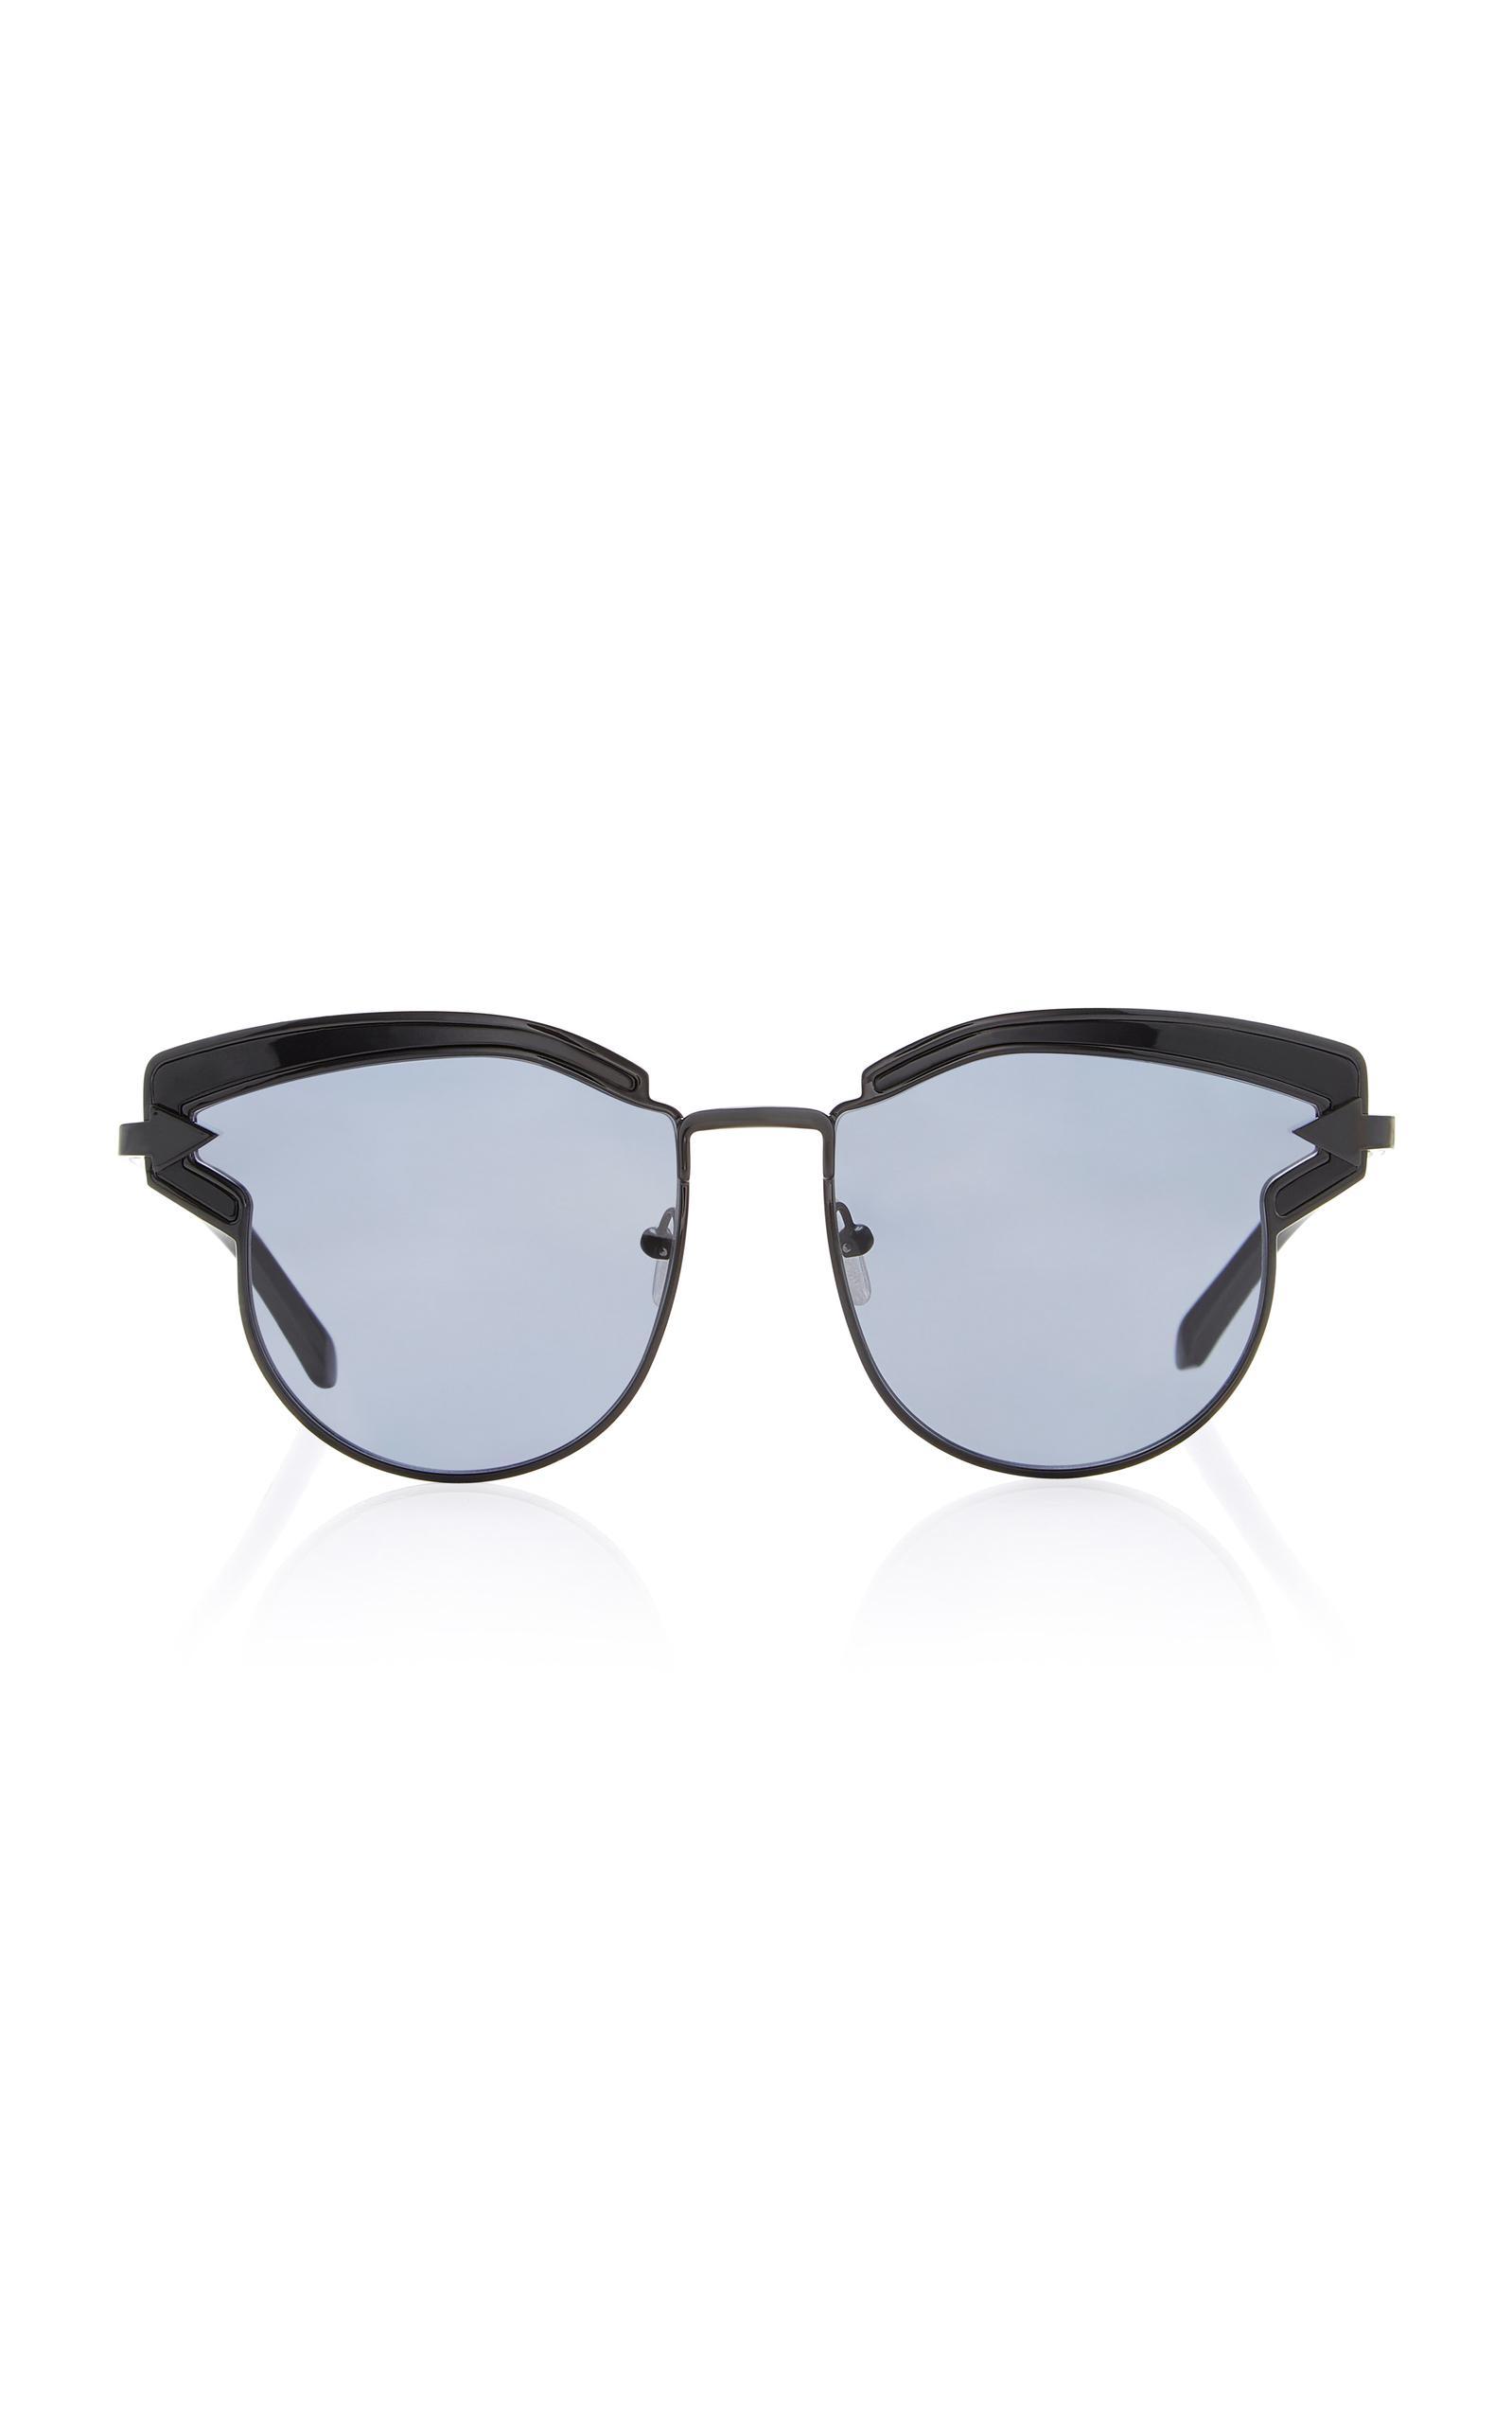 Treasure acetate cat-eye sunglasses Karen Walker Eyewear aoQhHnHS